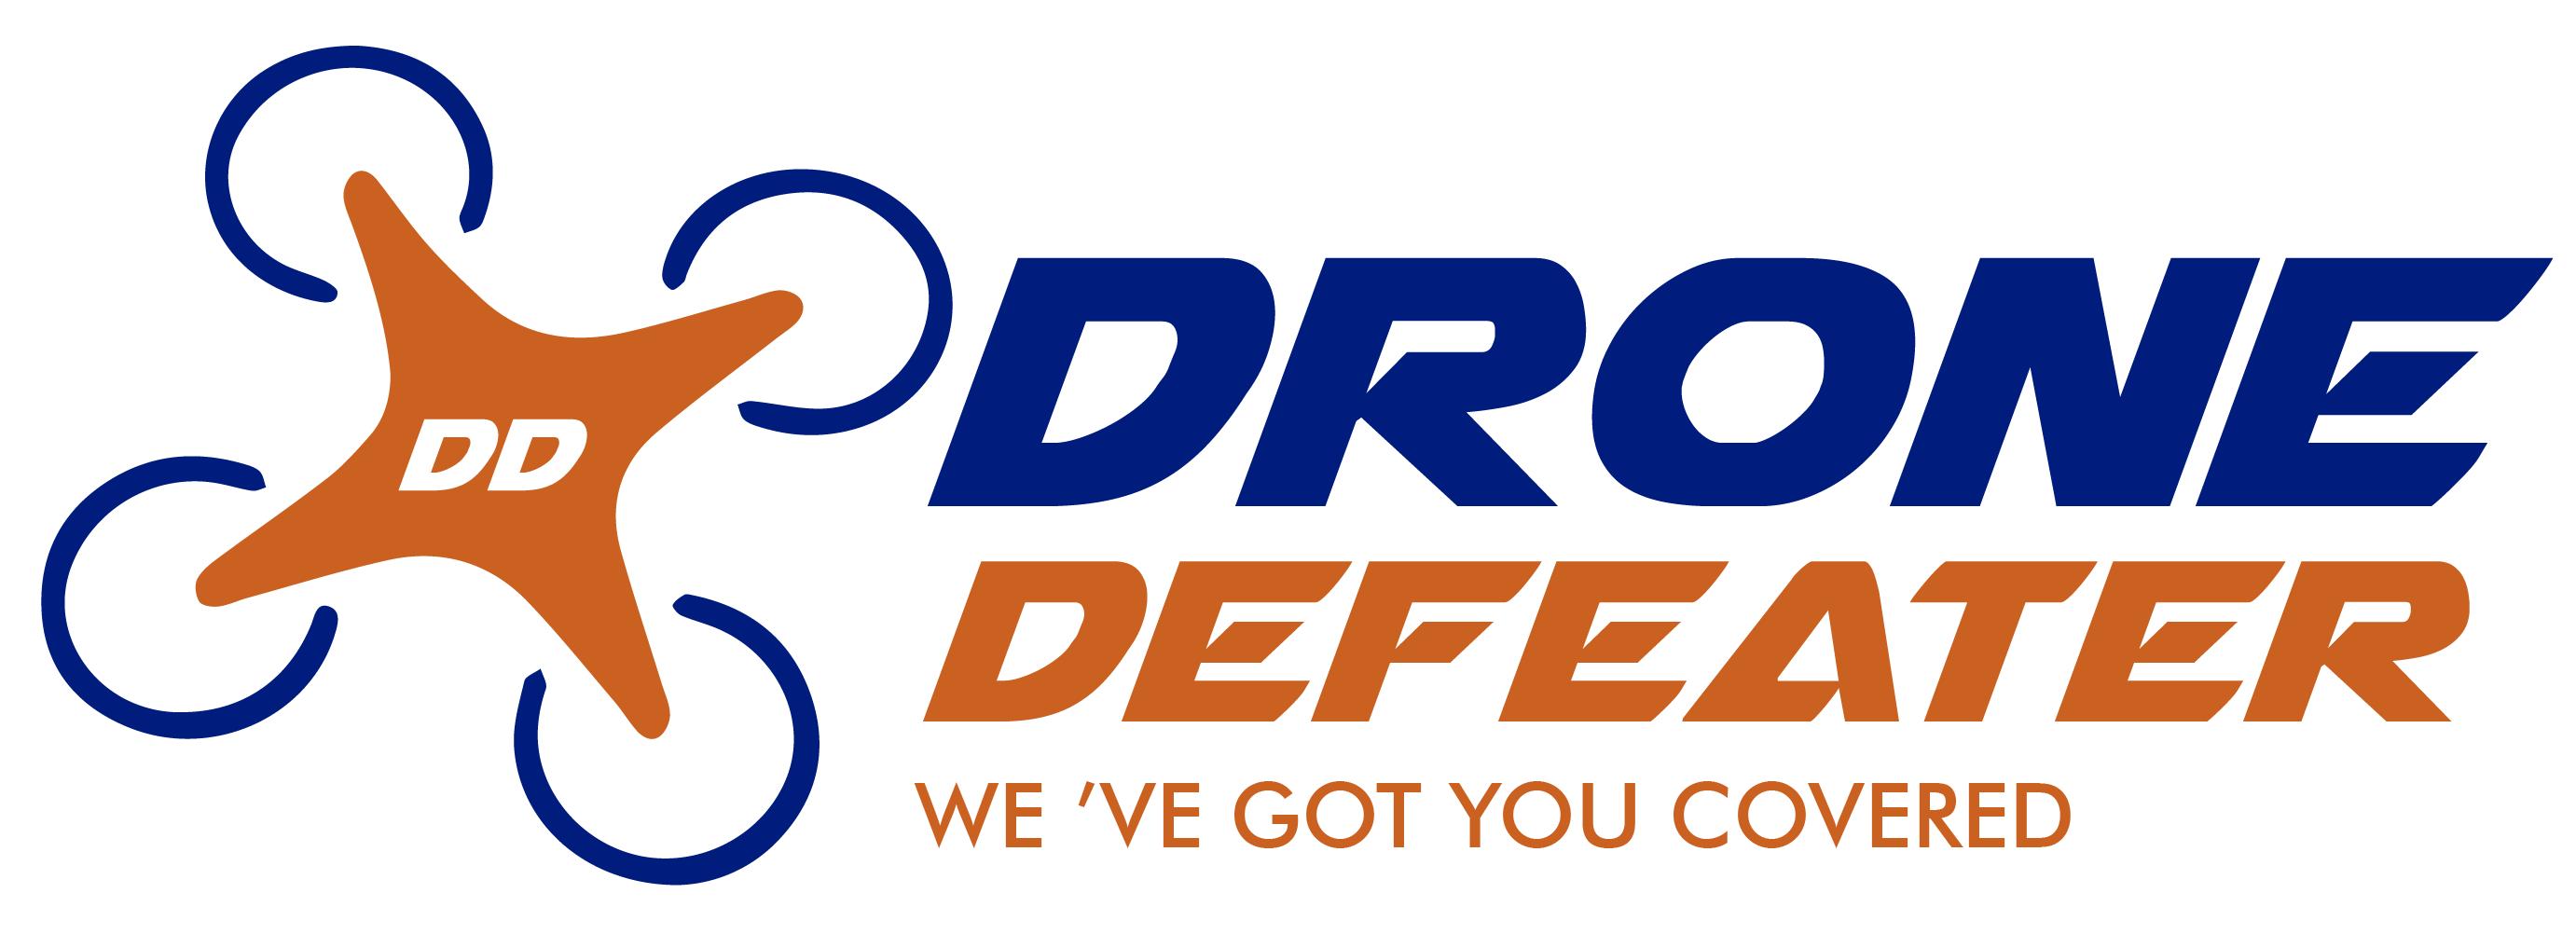 Logo Design by Alexander Guzman - Entry No. 20 in the Logo Design Contest Artistic Logo Design for Drone Defeater.